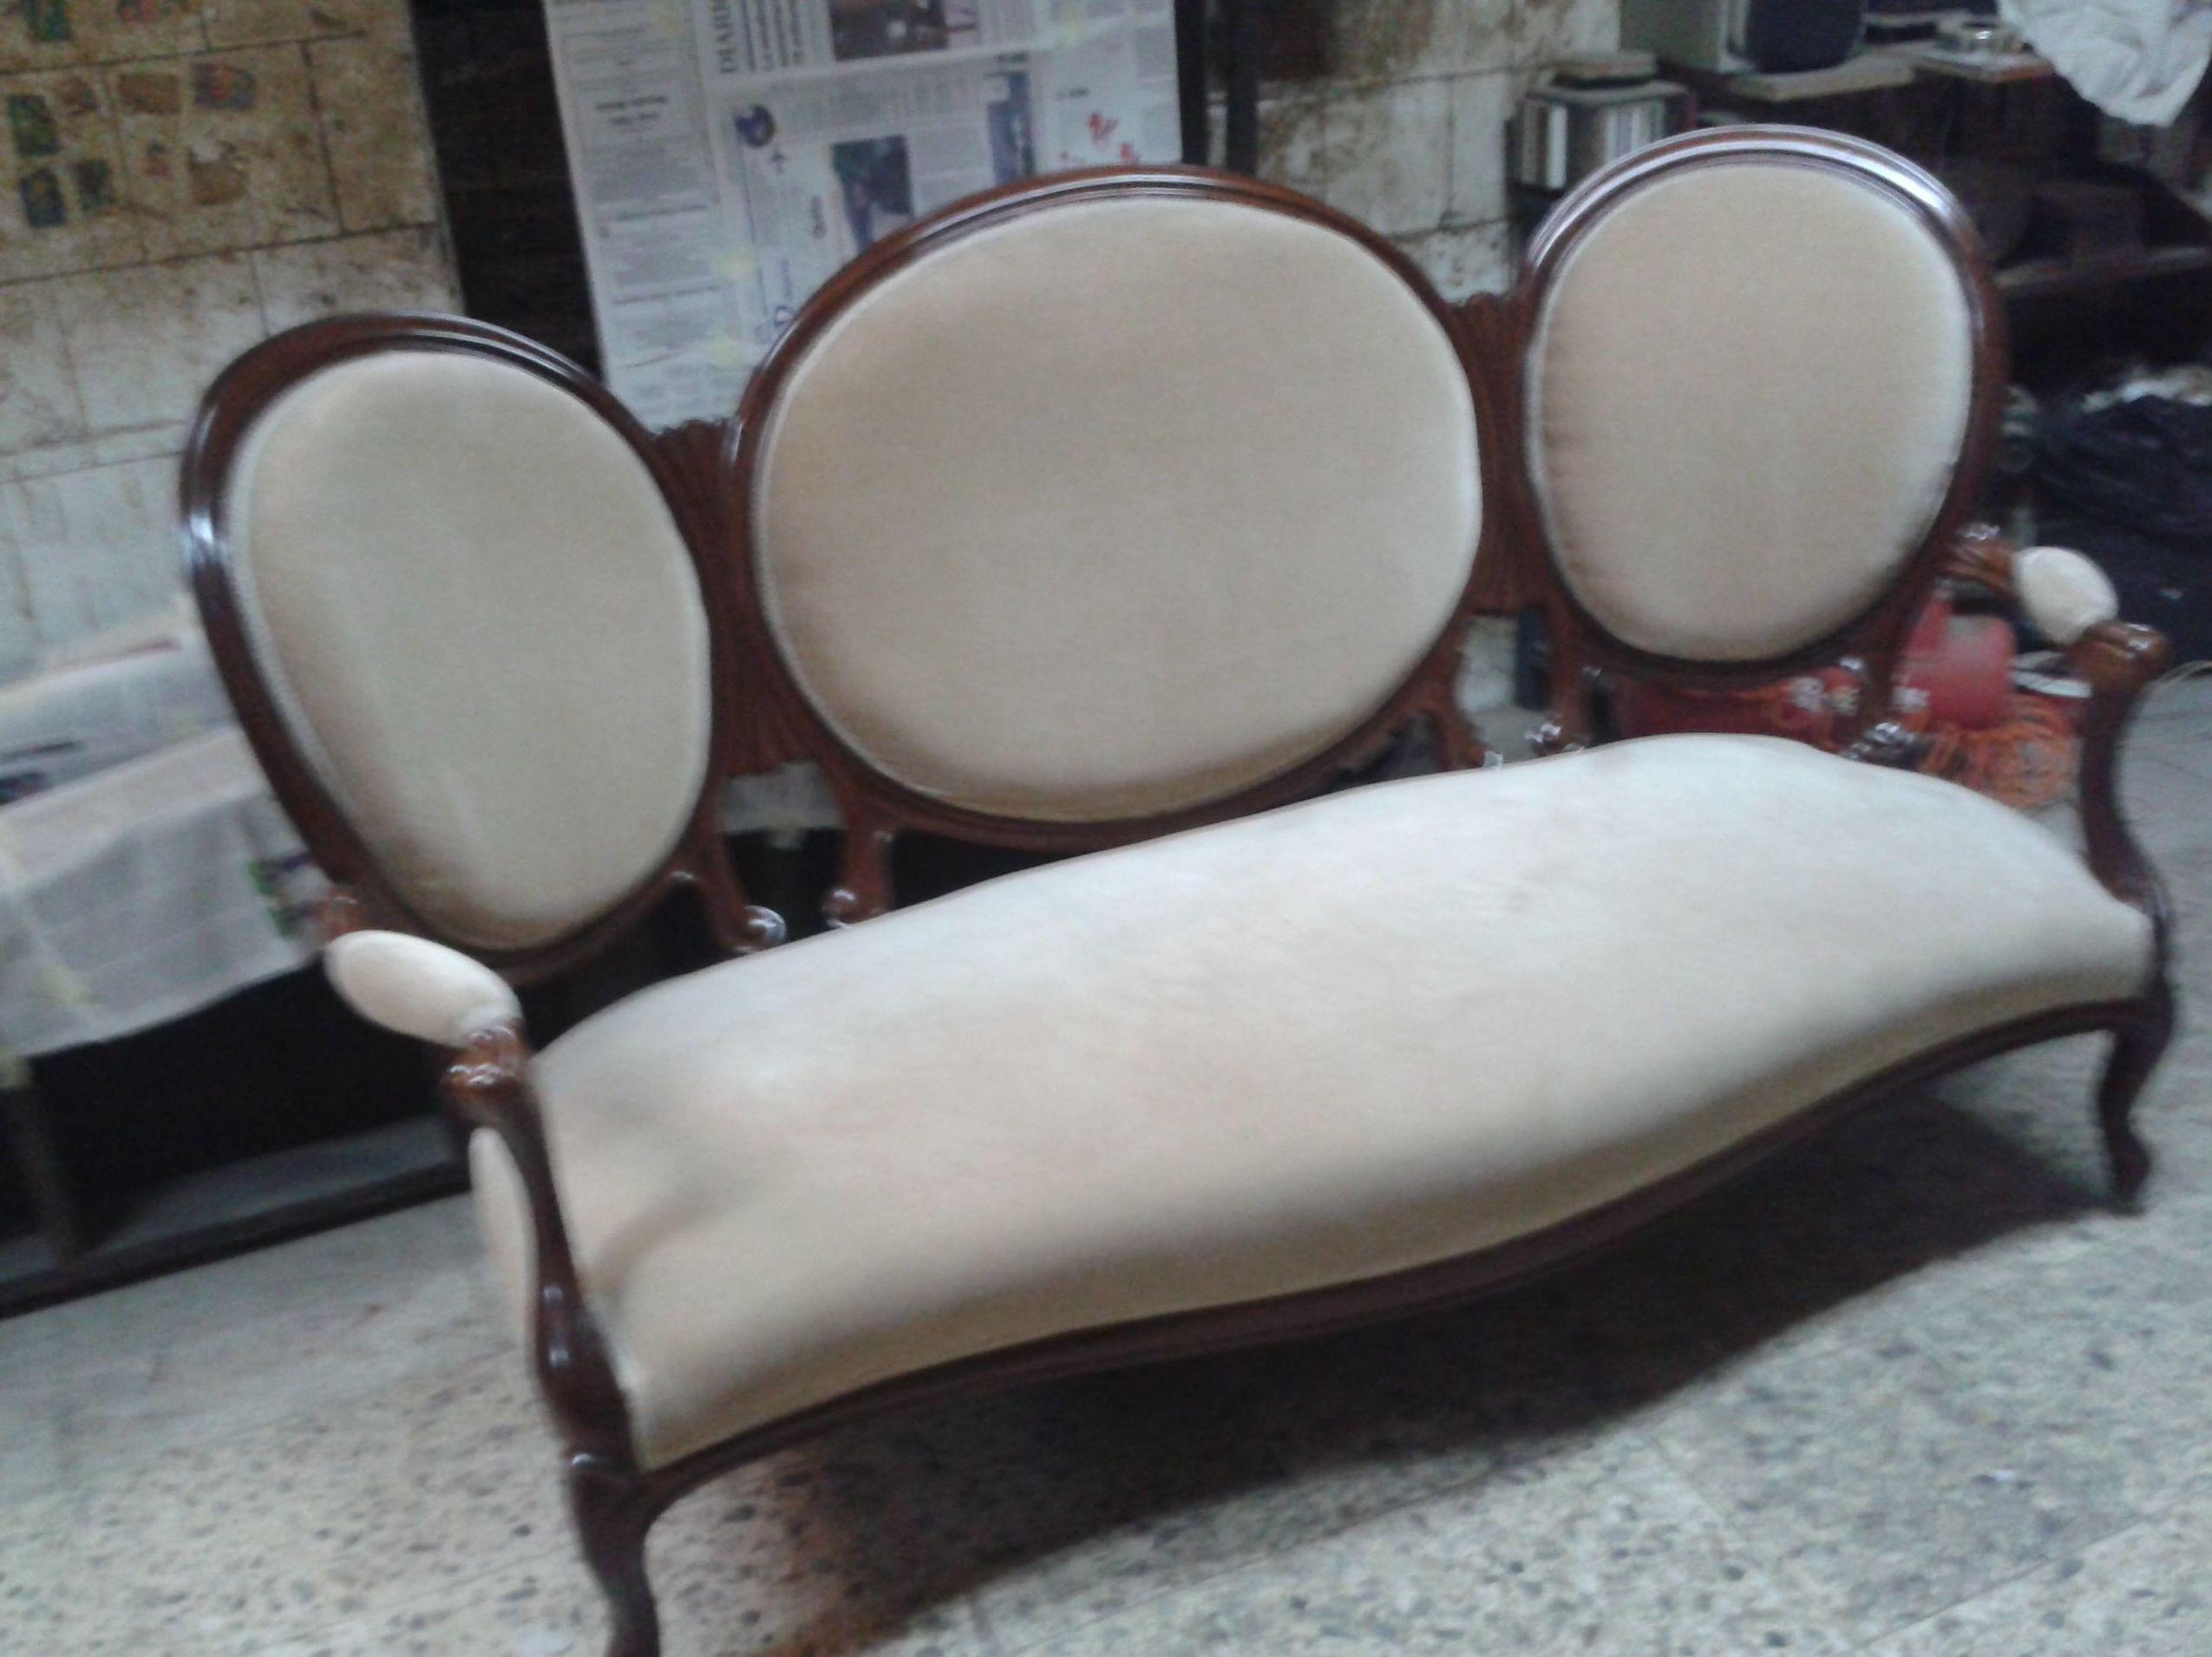 Foto 49 de Restauración de muebles en Pamplona | Lendik Restauración